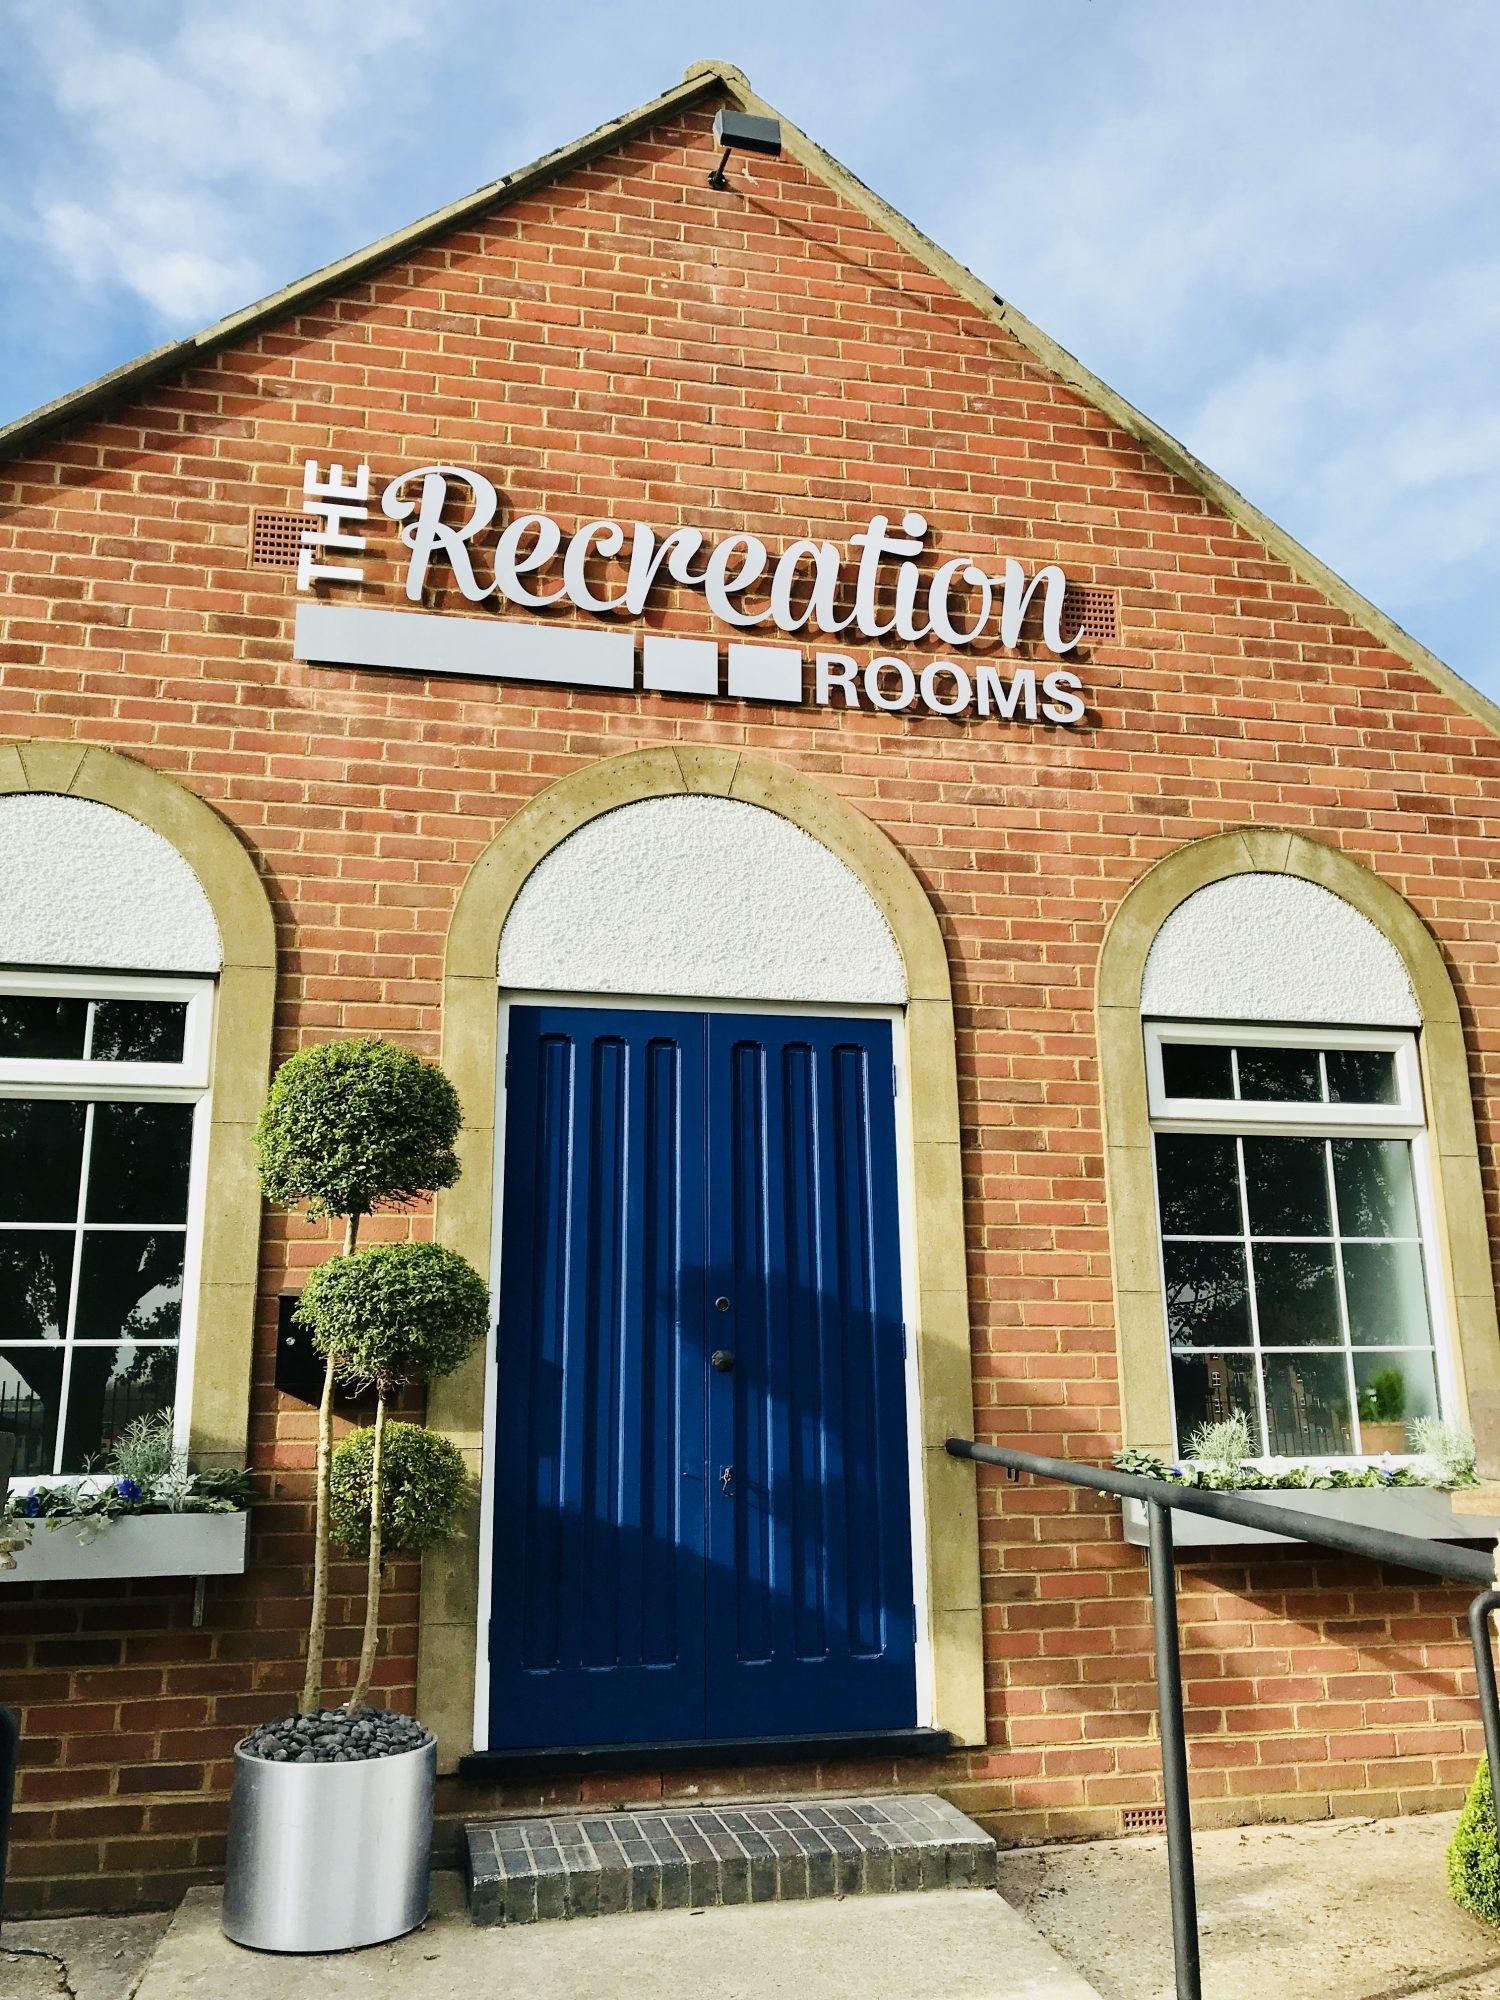 Leighton-Linslade recreation rooms